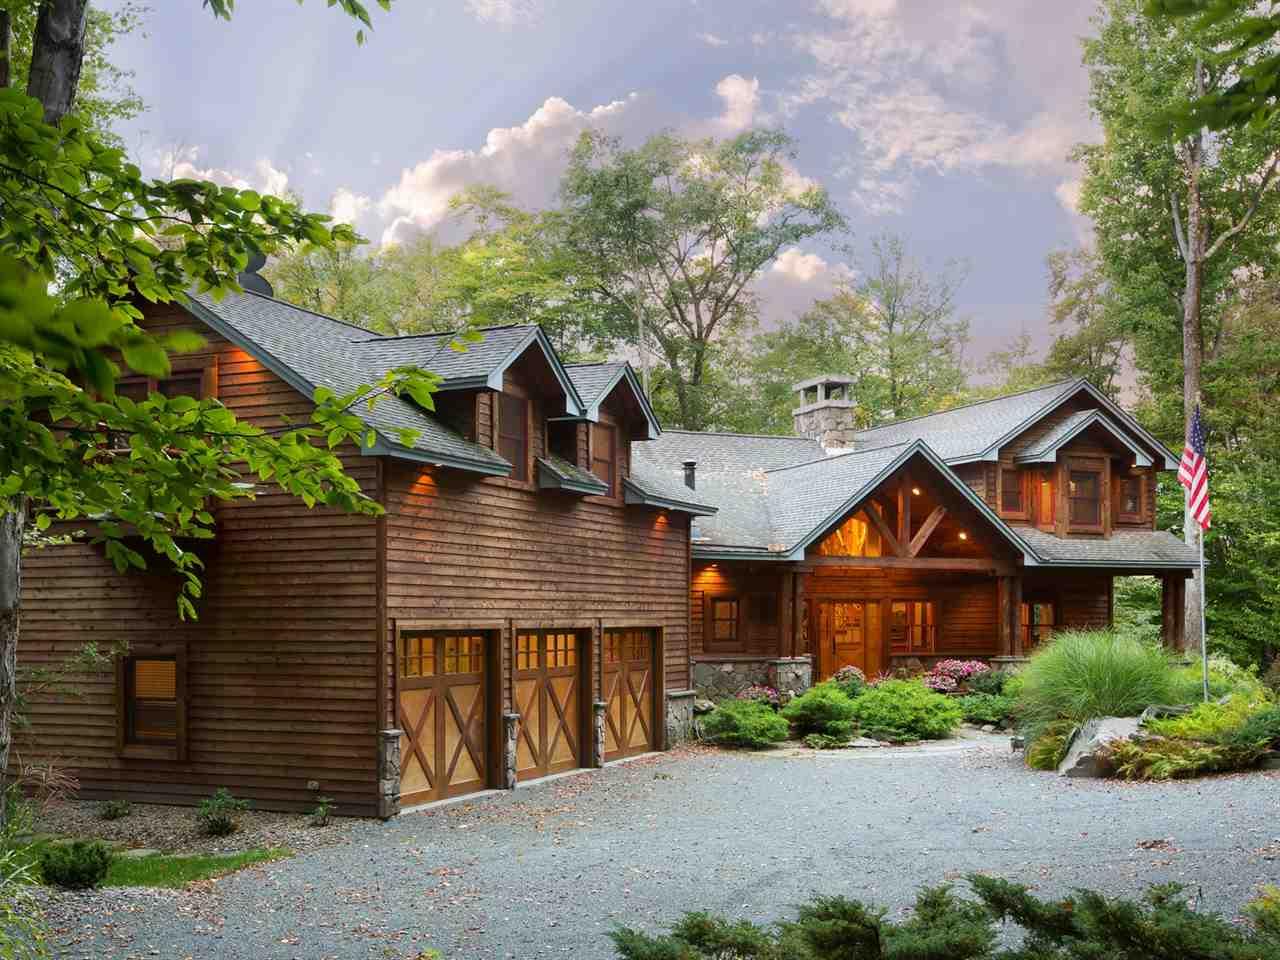 Real Estate for Sale, ListingId: 32642278, White Lake,NY12786